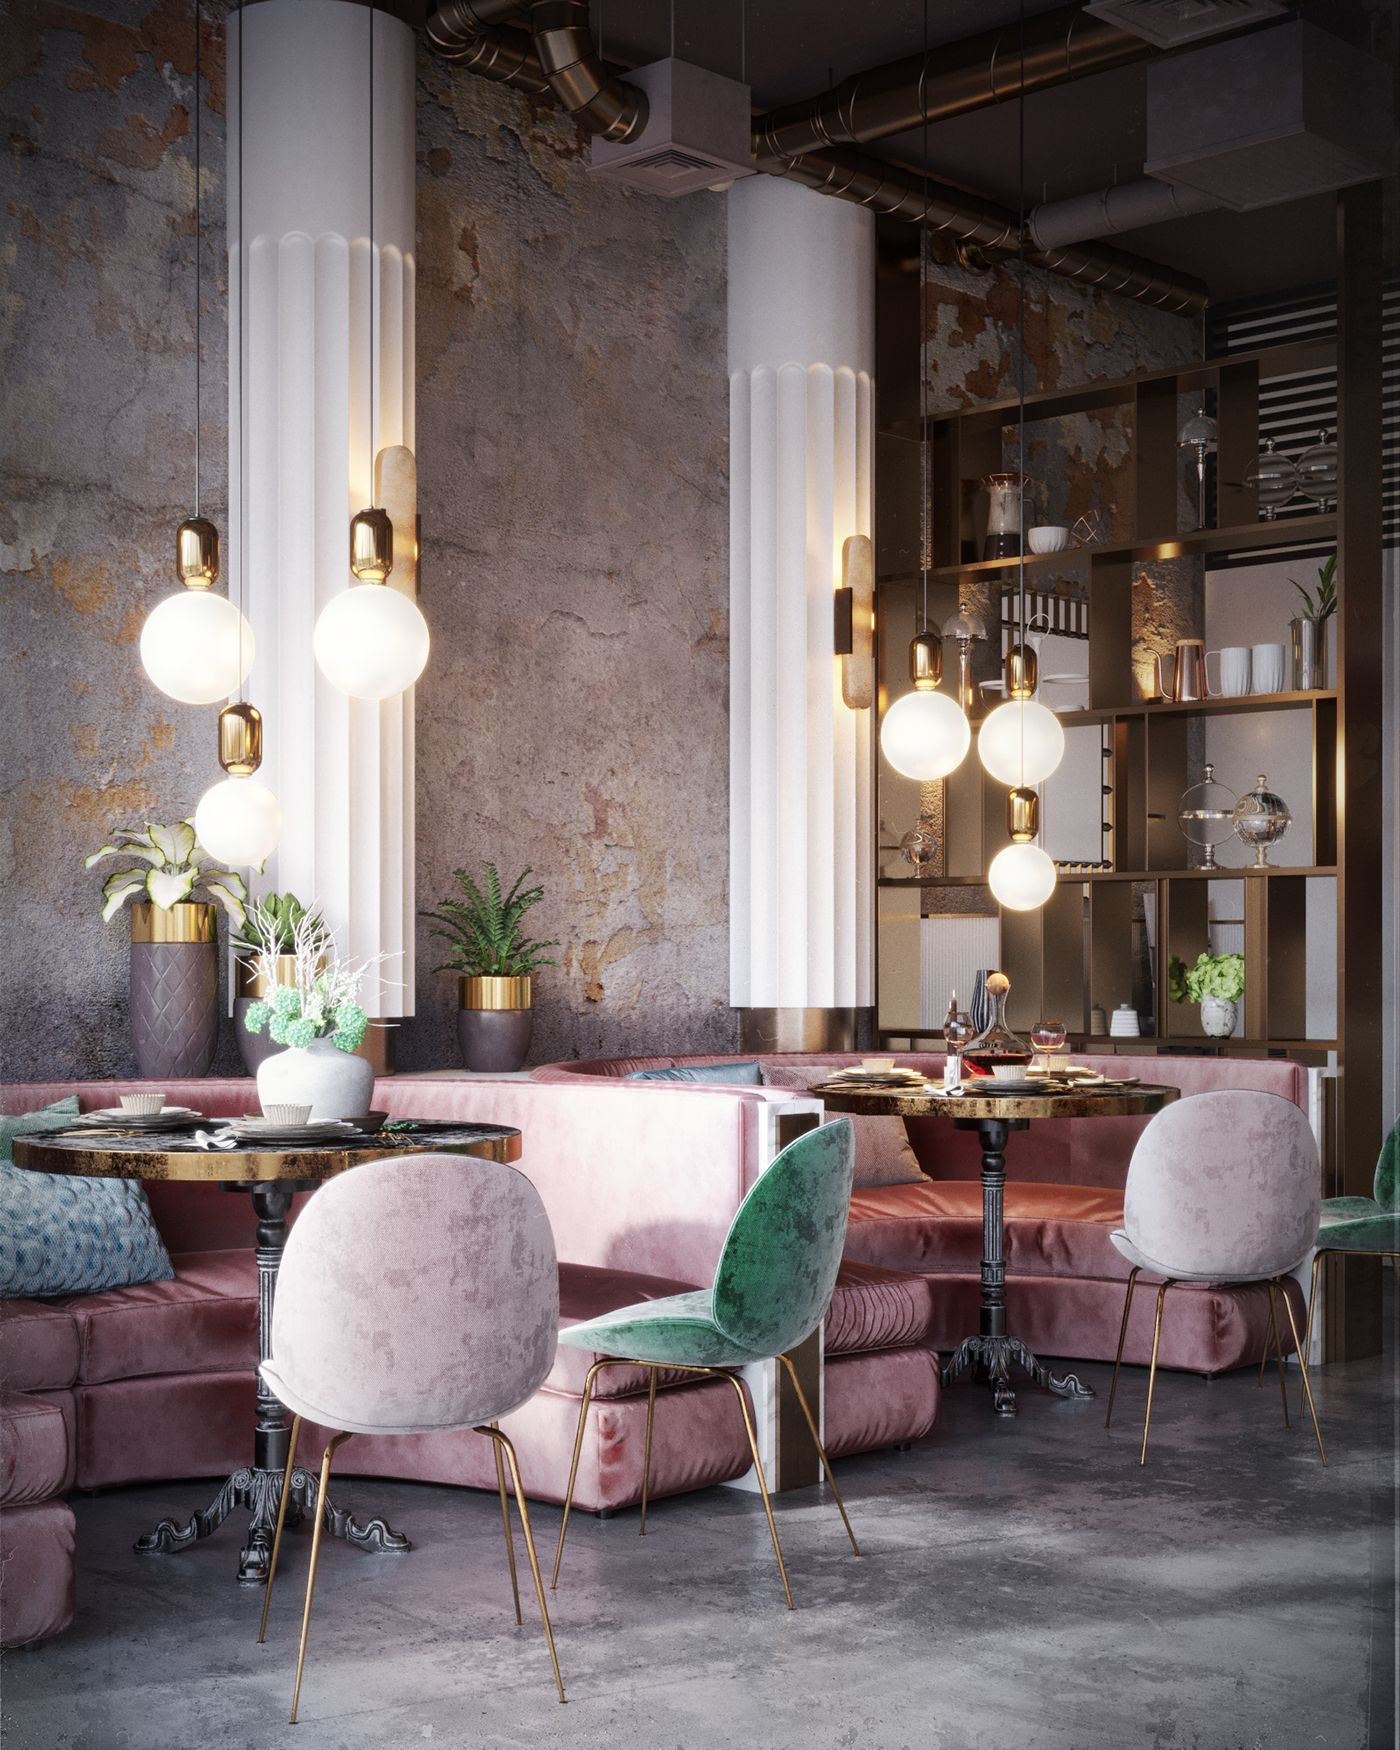 WANDERLUSTING: contemporary restaurant design, so pink & pretty #artdecointerior